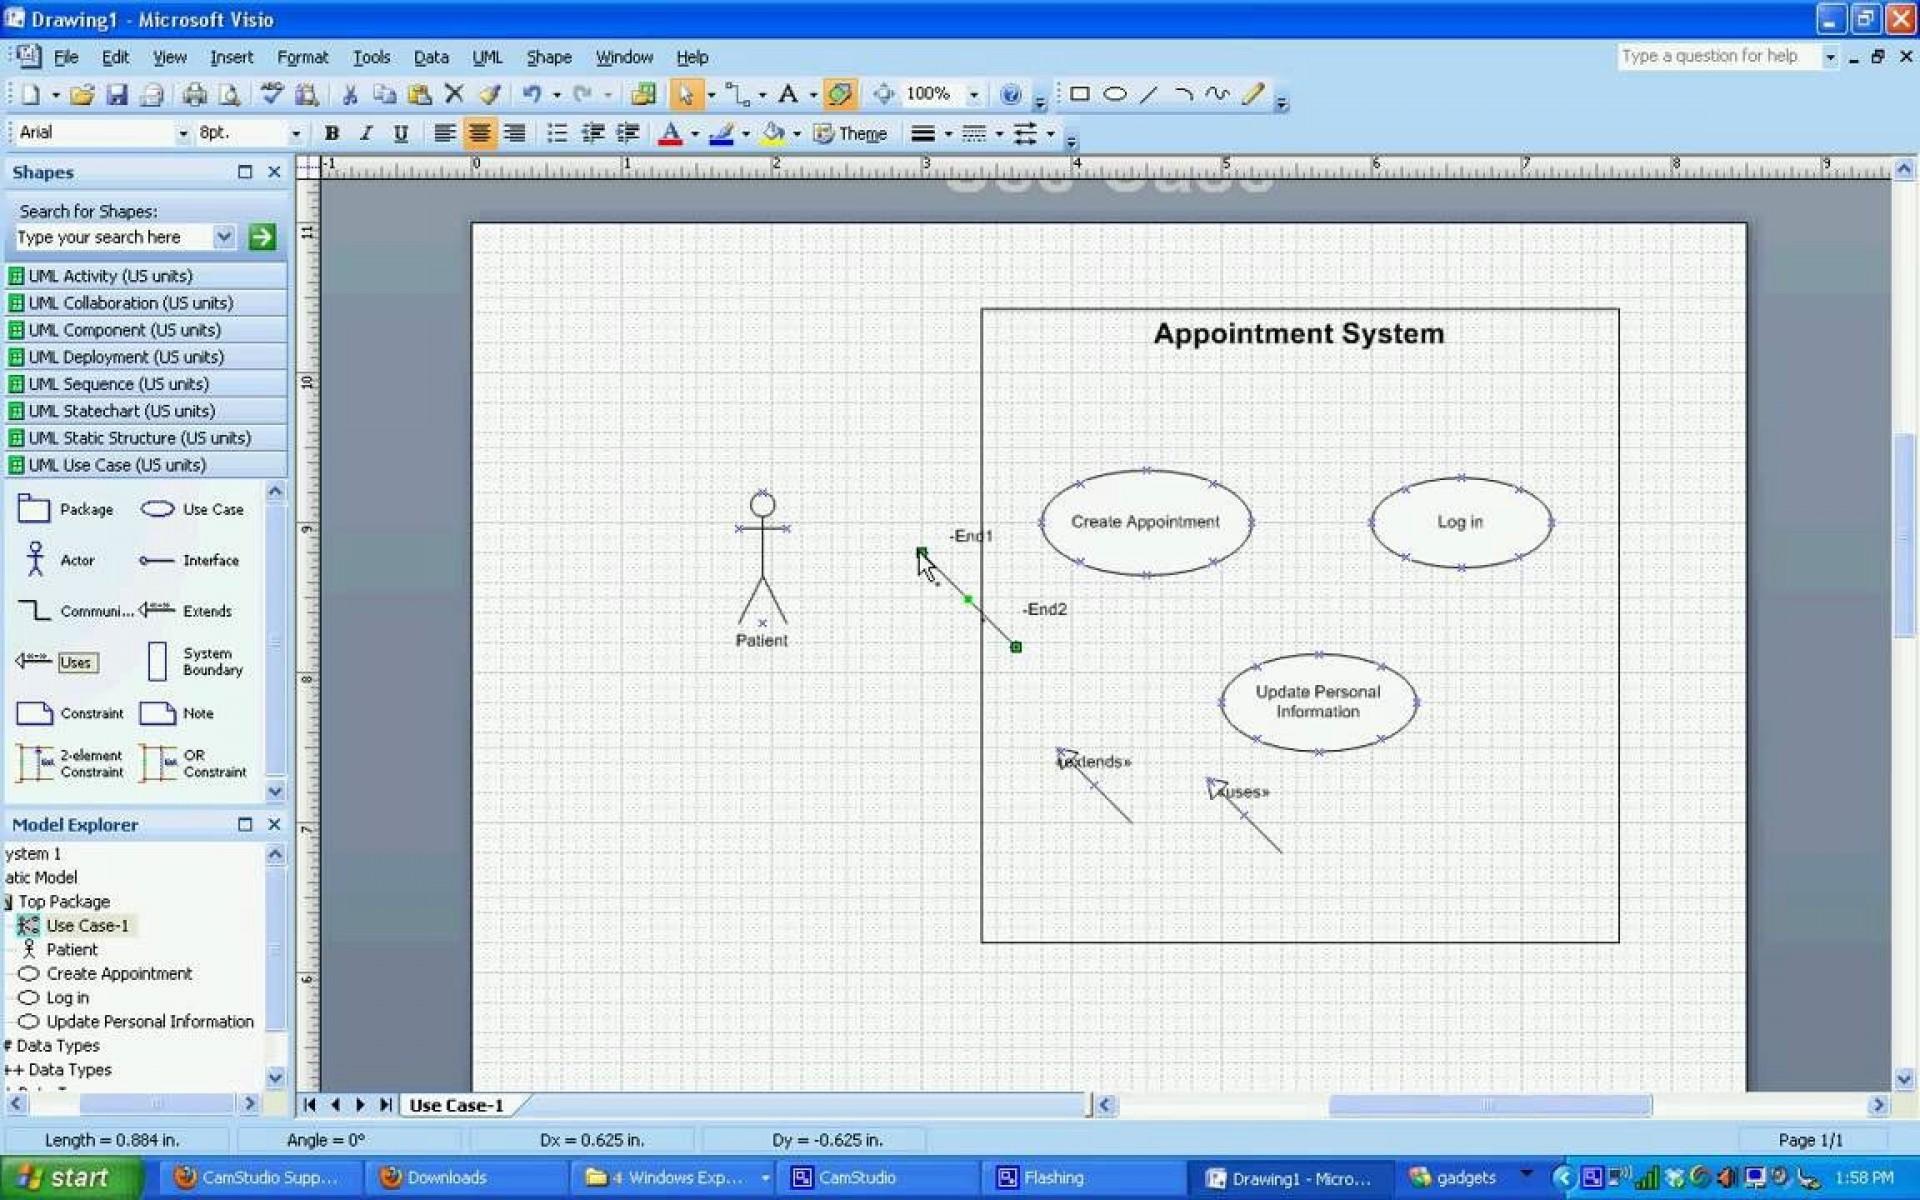 005 Top Use Case Diagram Microsoft Visio 2010 Highest Clarity 1920